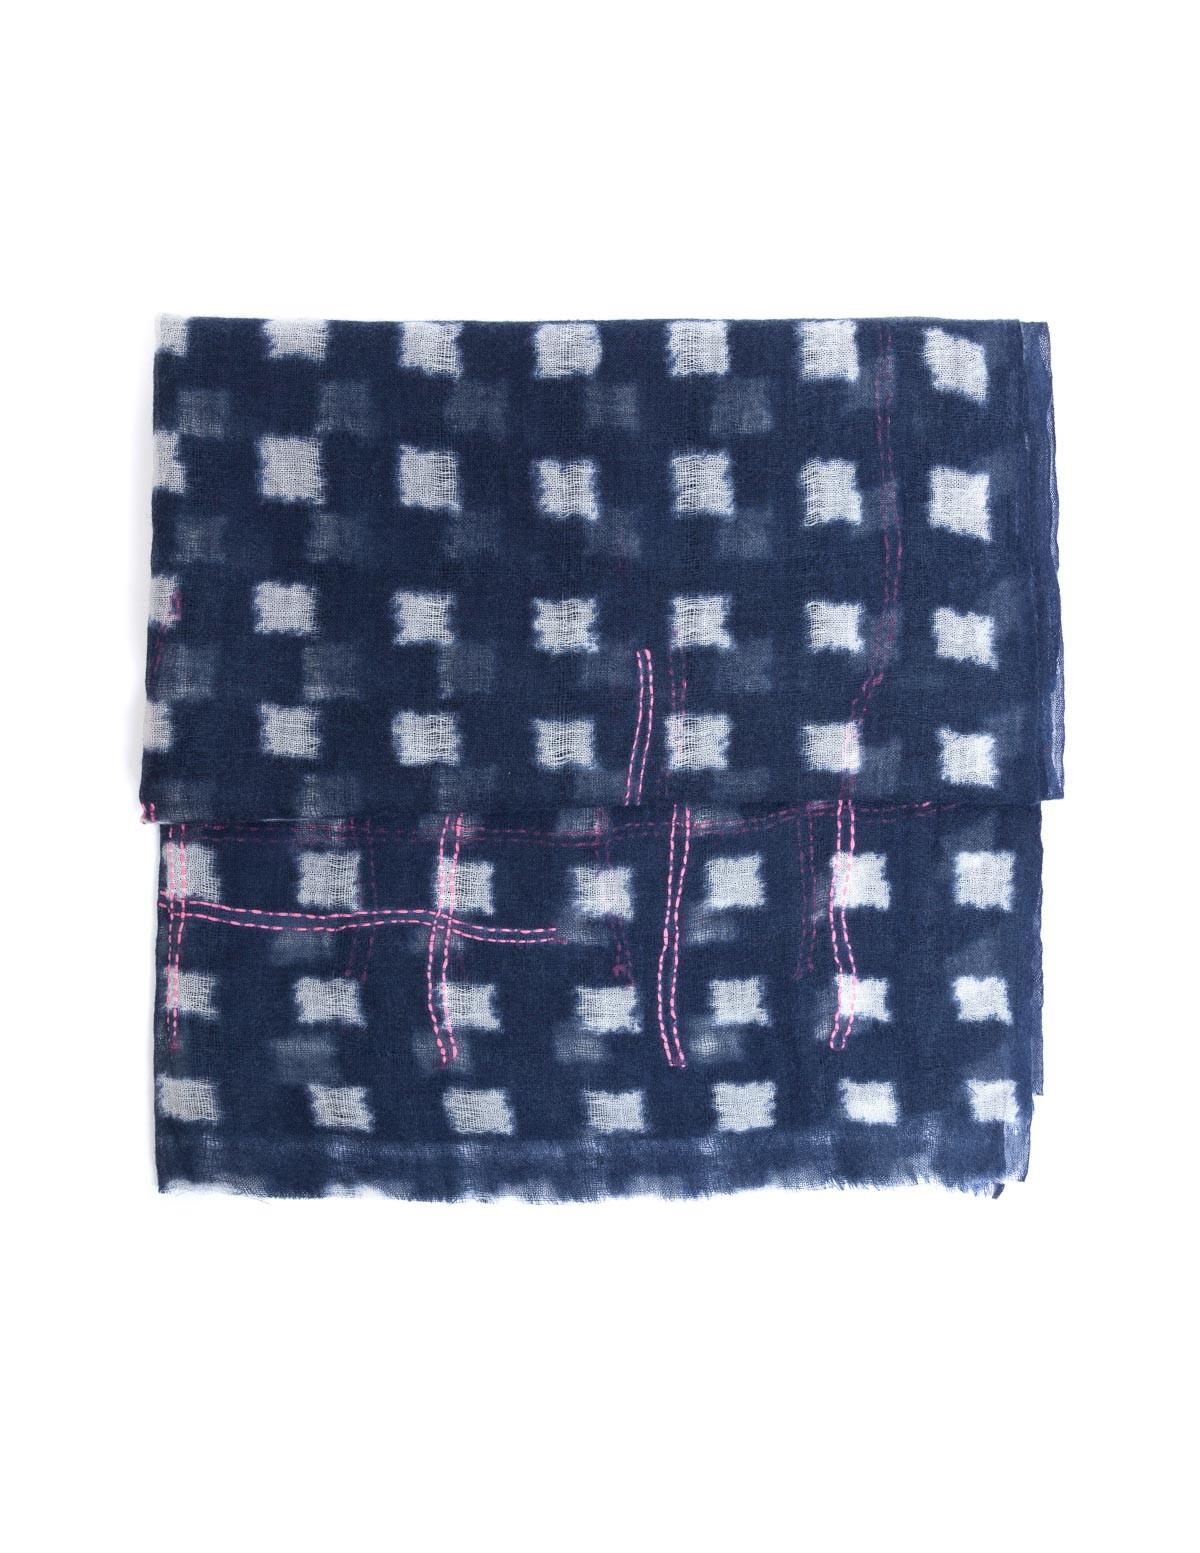 Fular de lana